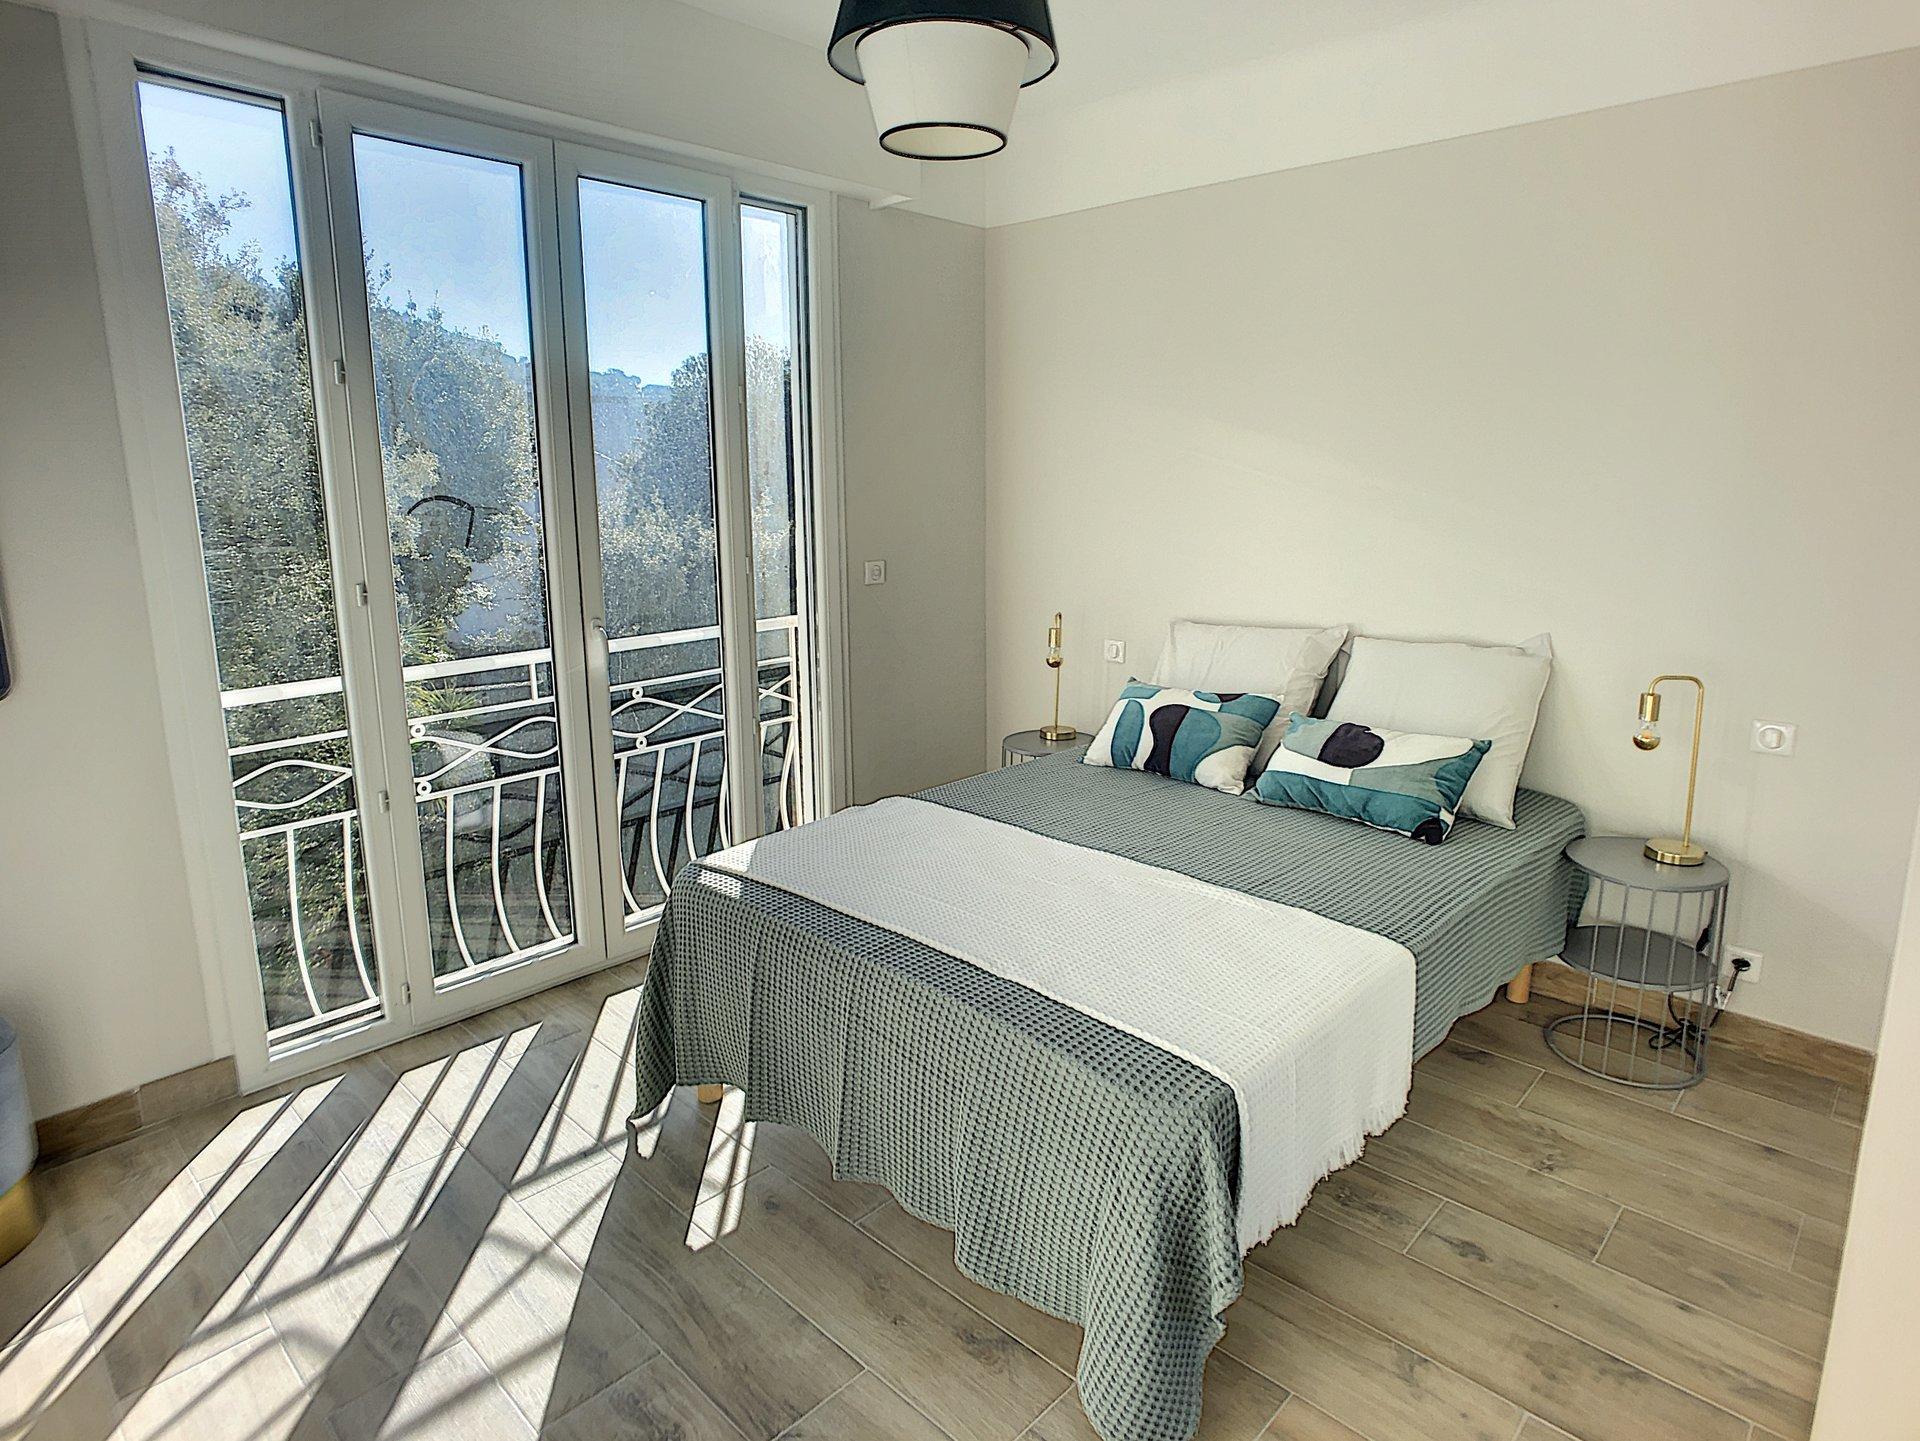 Splendid 3 bedroom apartment Seaview